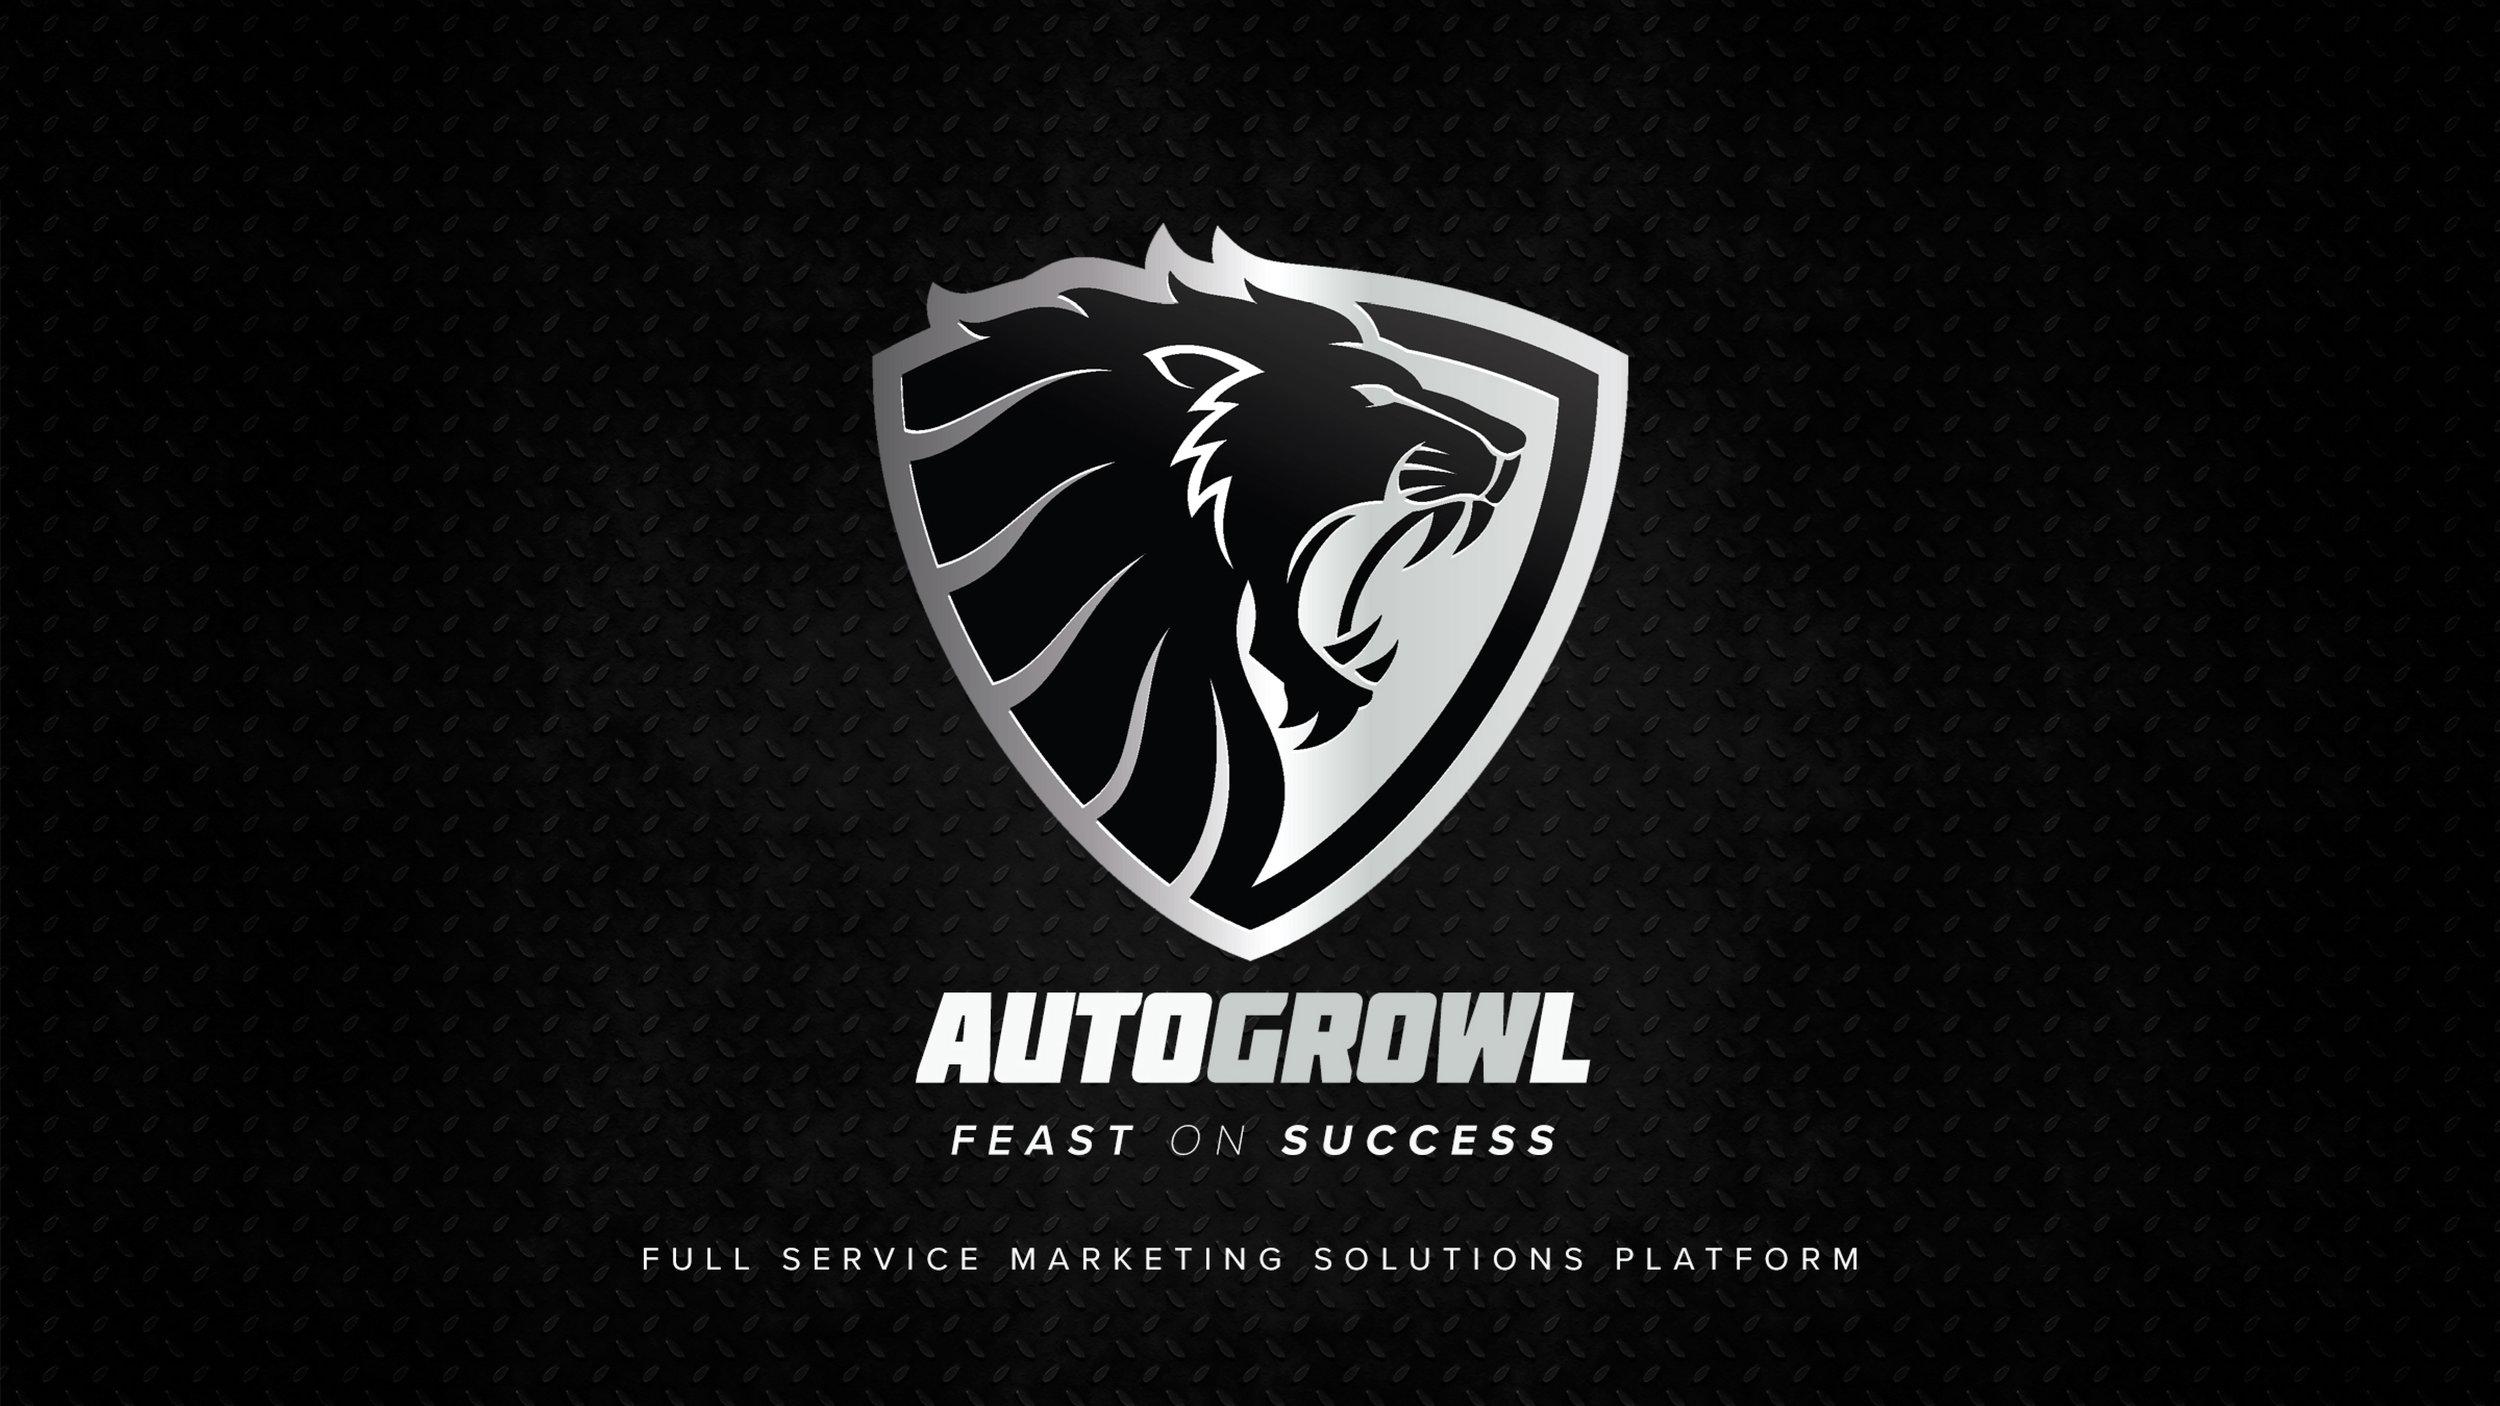 Autogrowl_Team-1.jpg